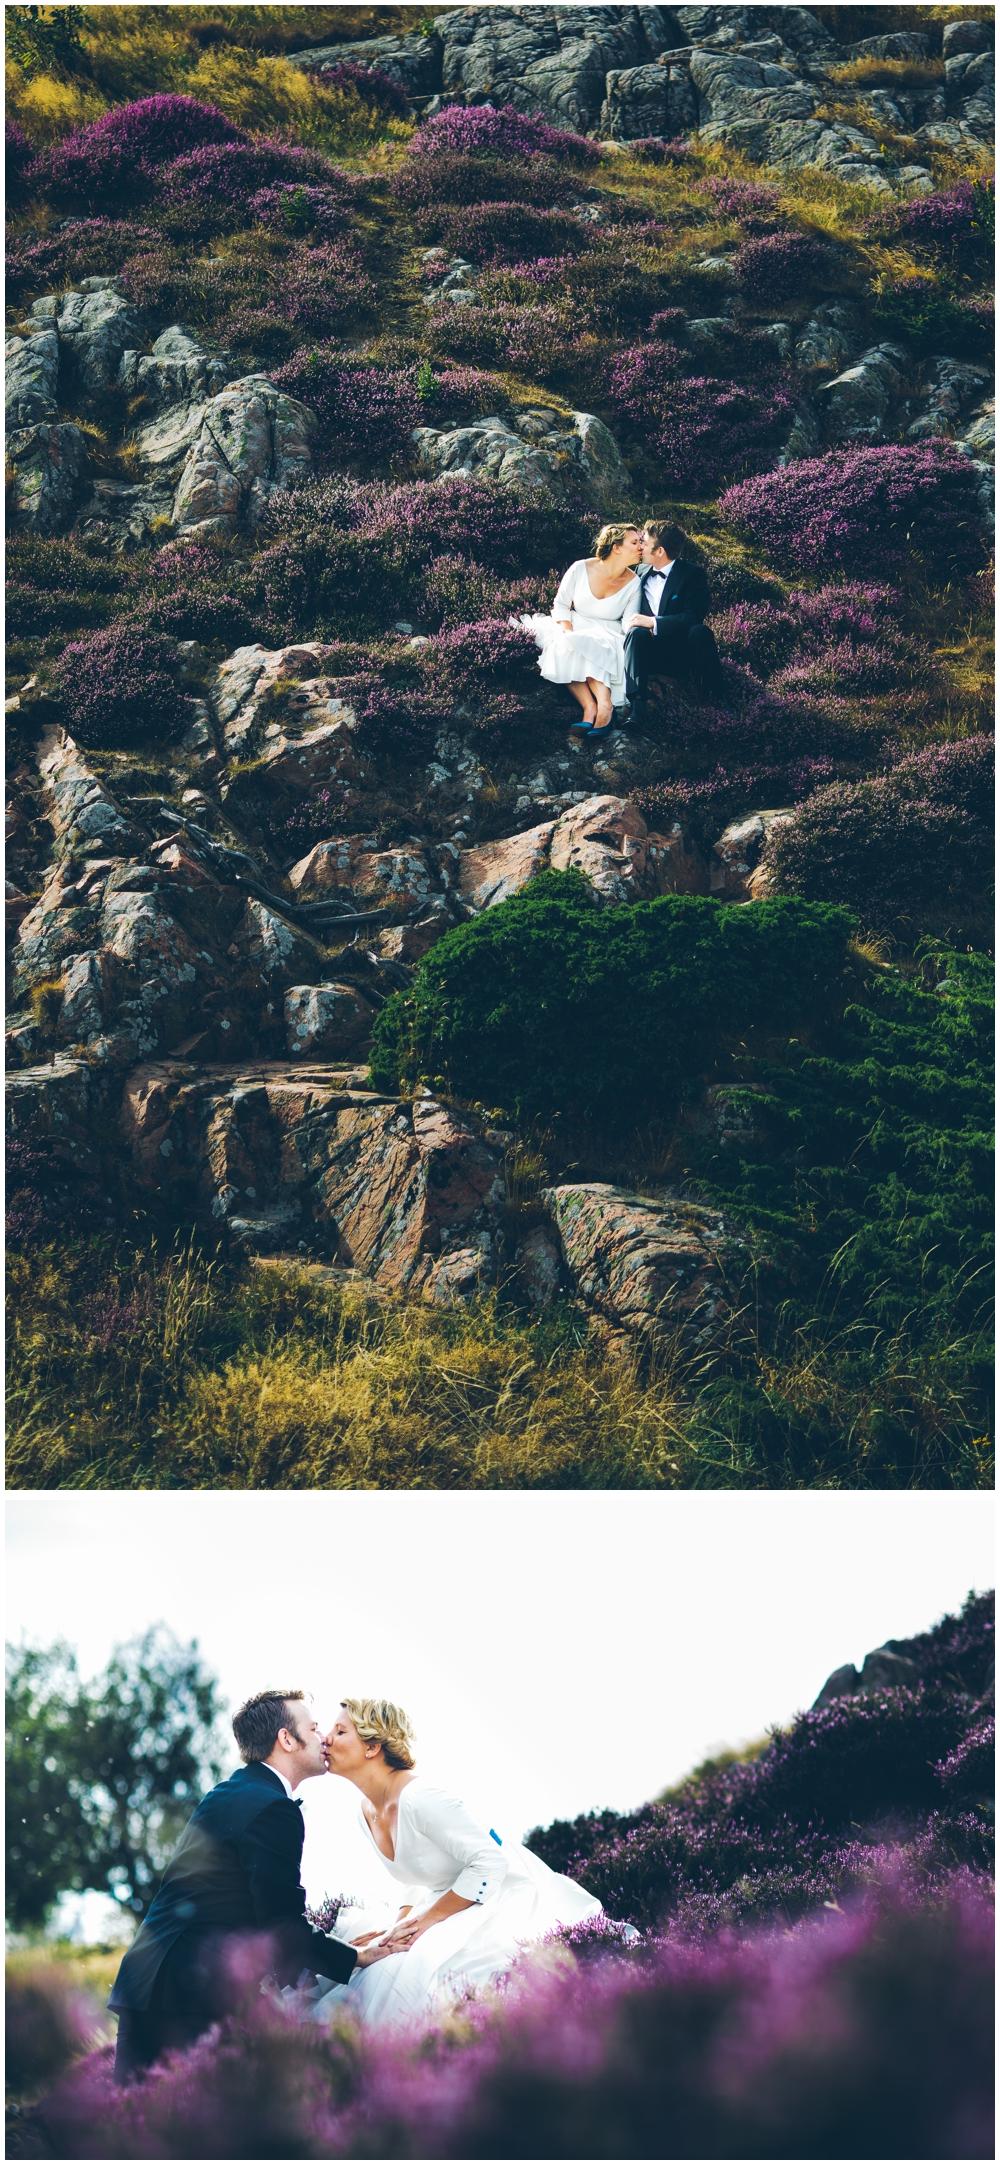 LE HAI LINH Photography-Hochzeitsfotograf-afterweddingshooting-malmoe-schweden_sdfdsff.jpg